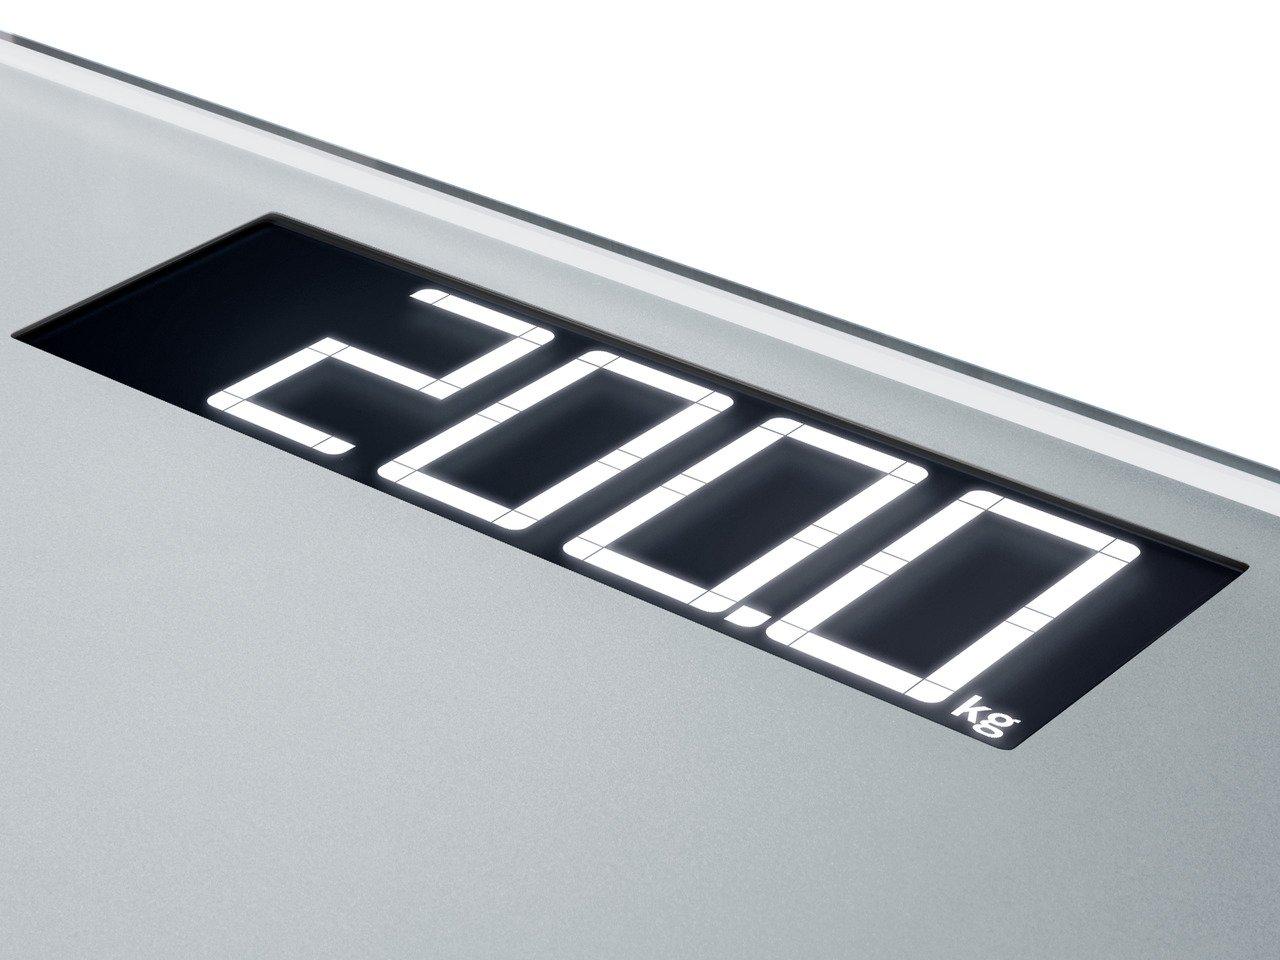 Soehnle 63864 Pesa Persona Elettronica Style Sense Comfort 600 200 kg